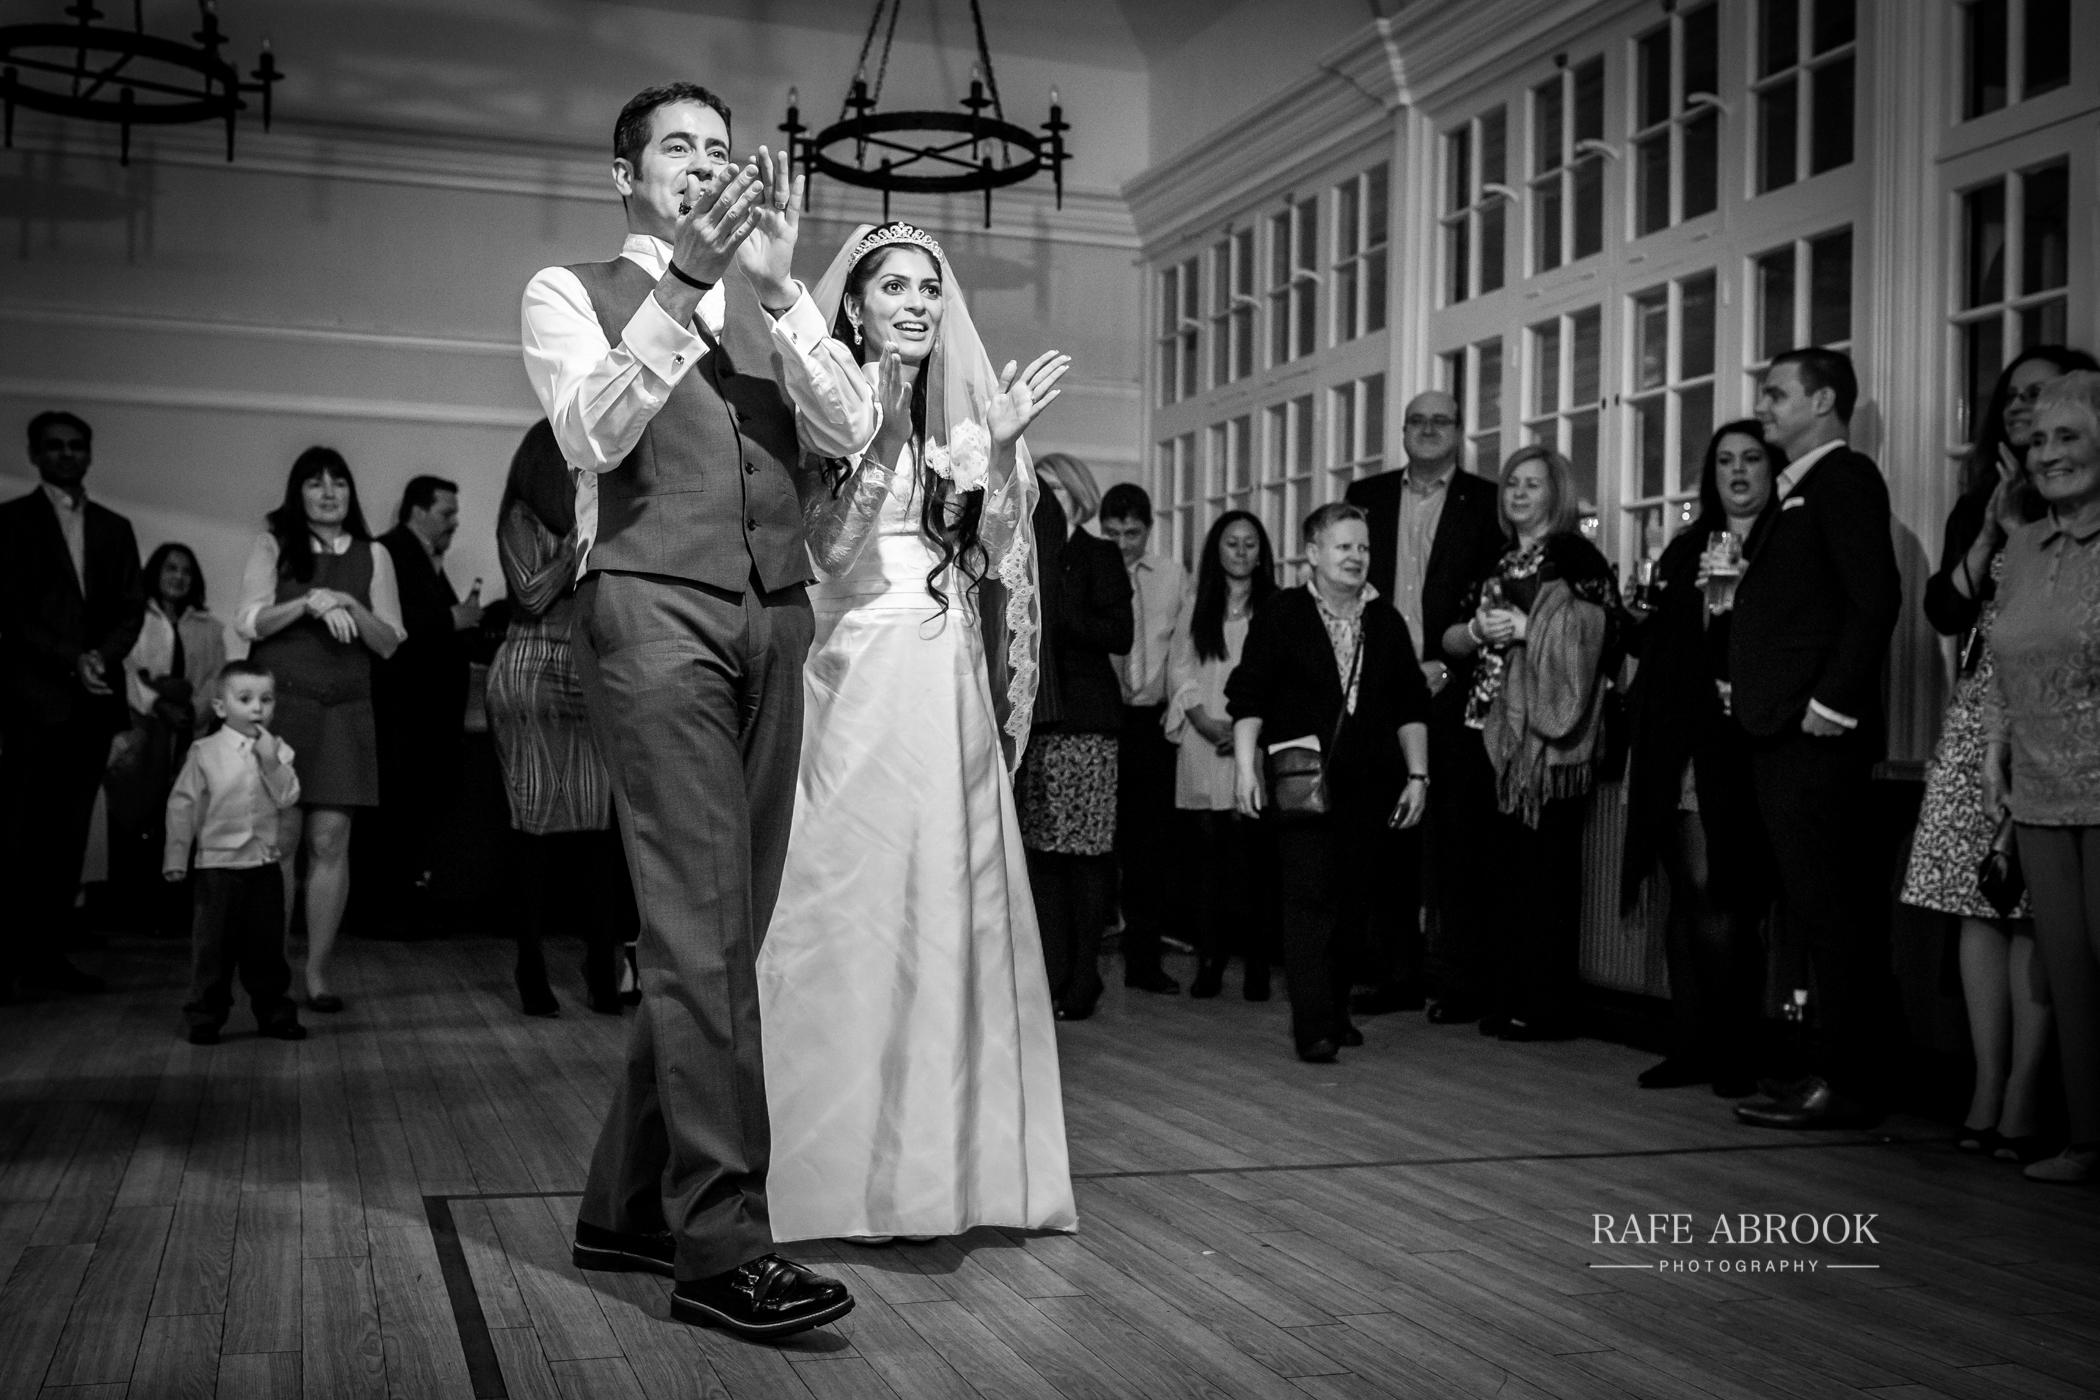 roma & pete wedding hampstead shenley hertfordshire -491.jpg